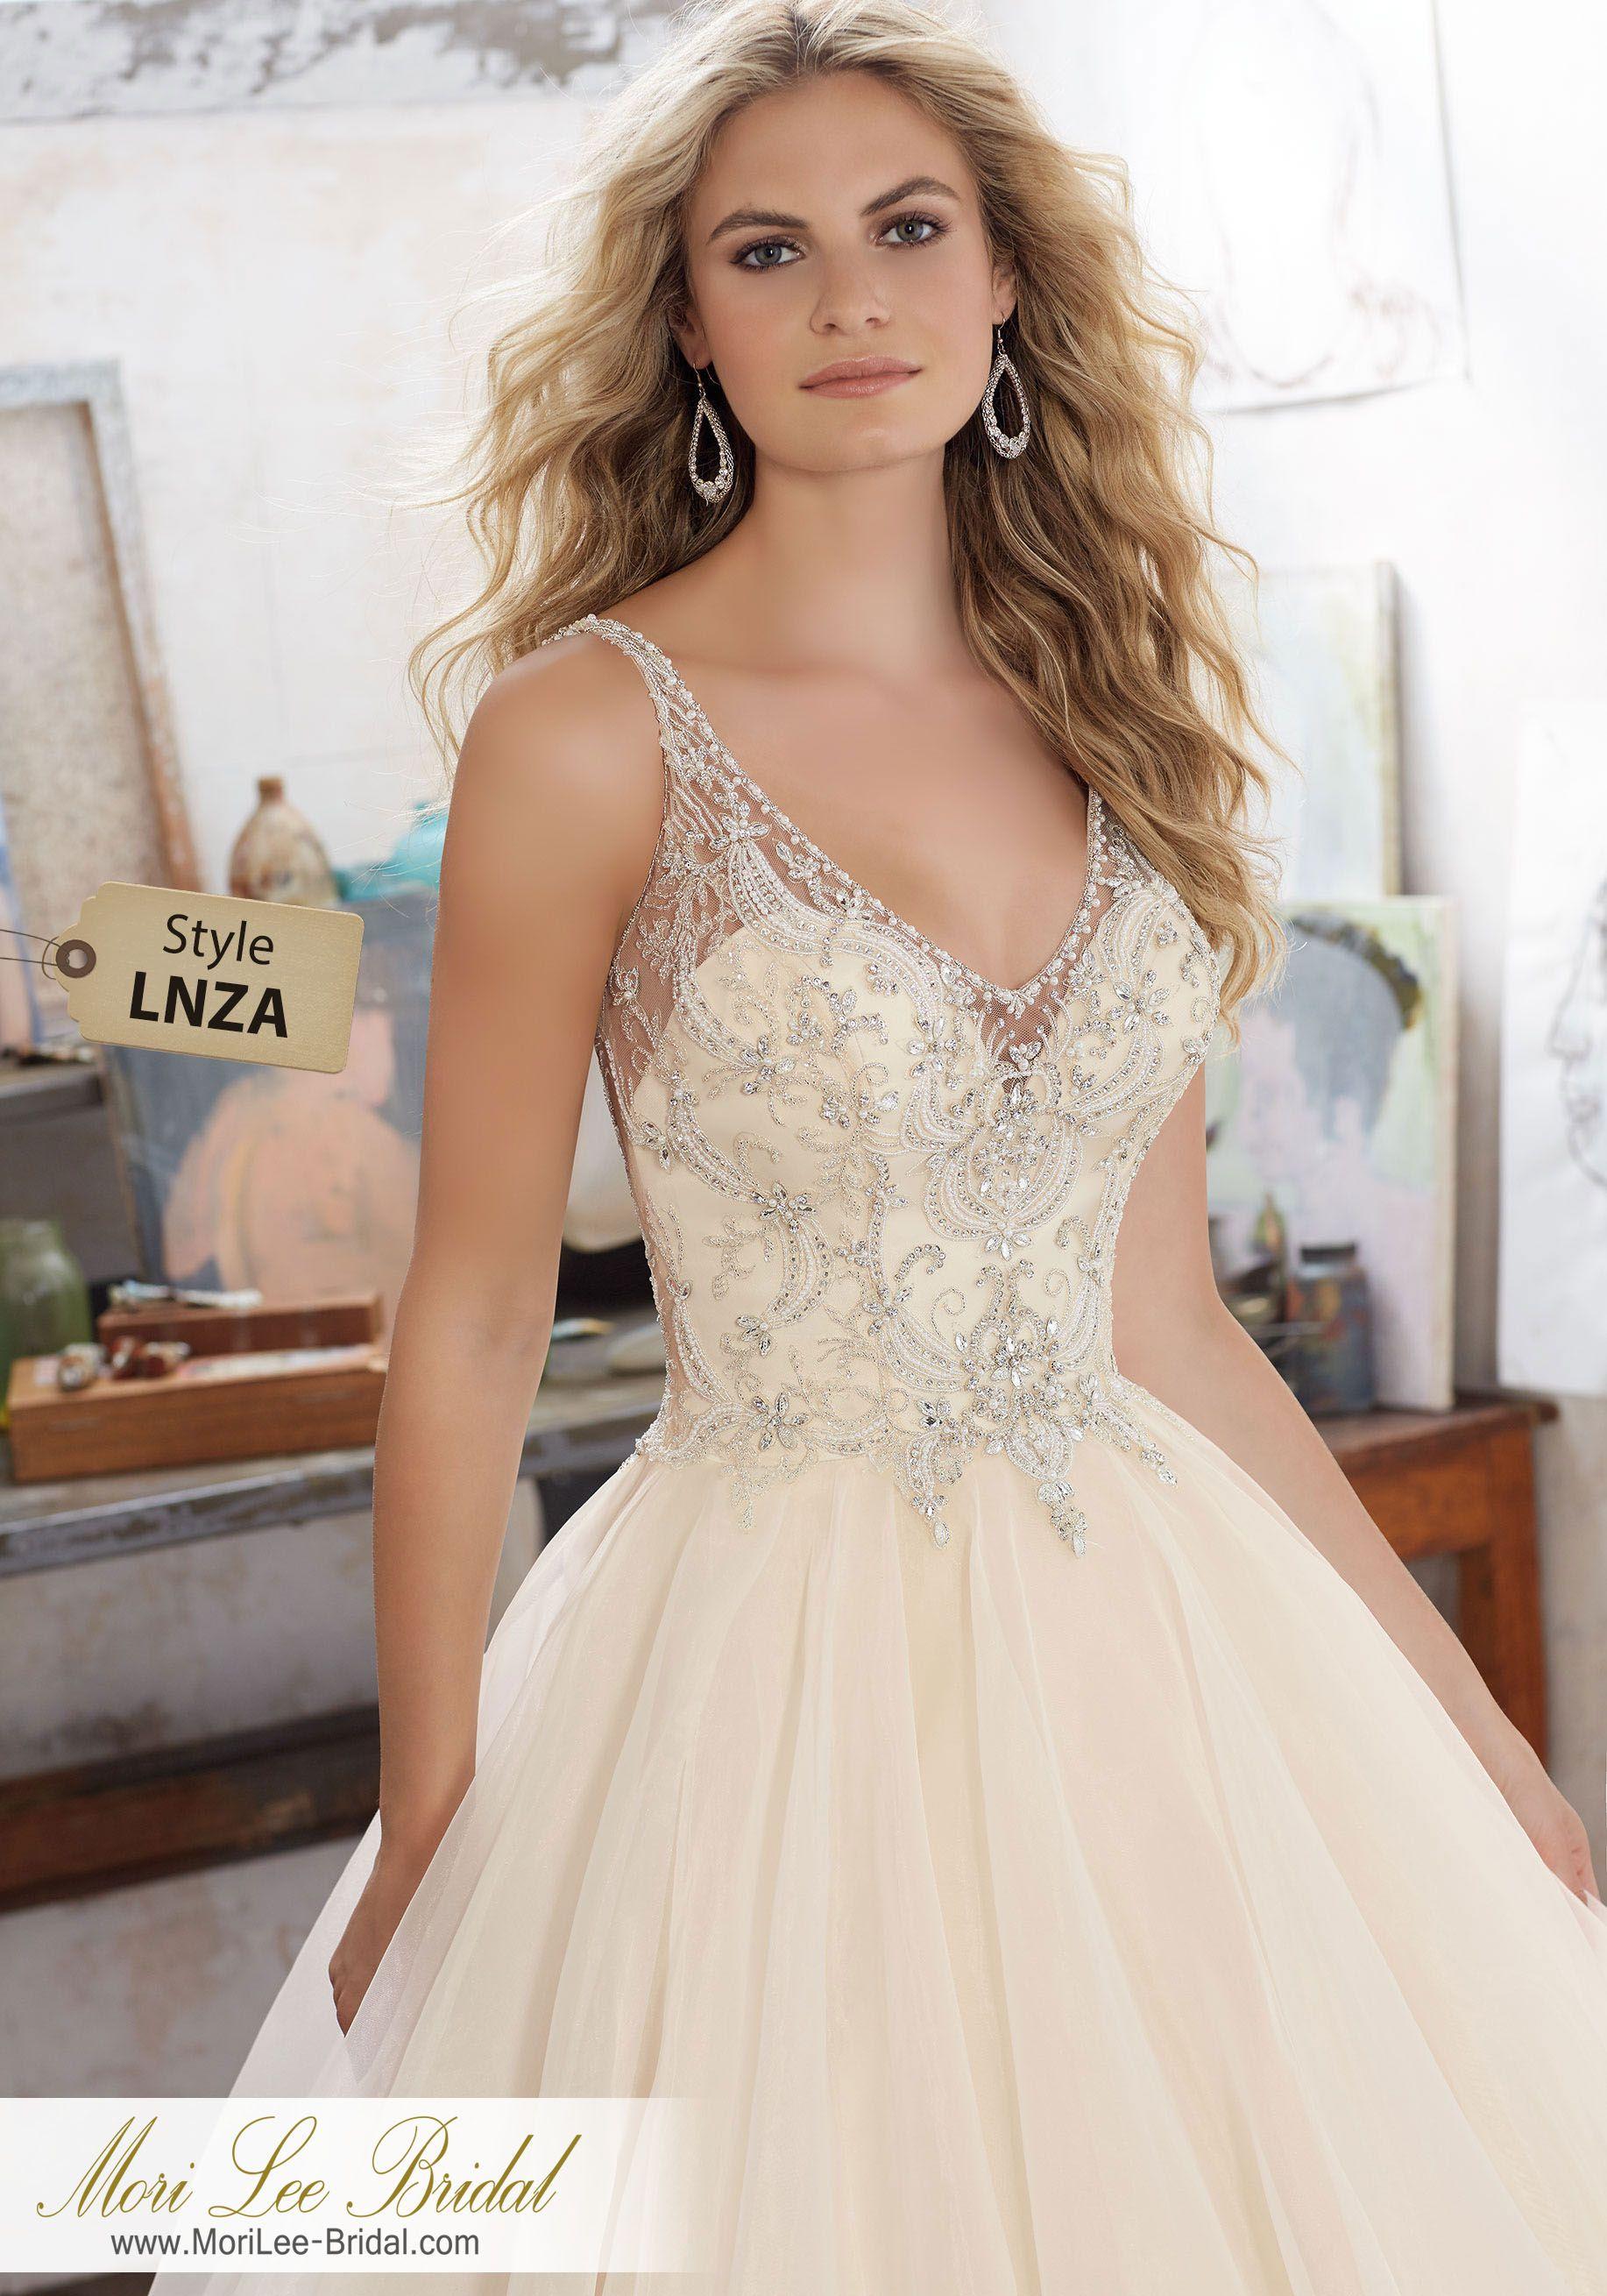 Style lnza madison wedding dress romantic bridal ballgown features